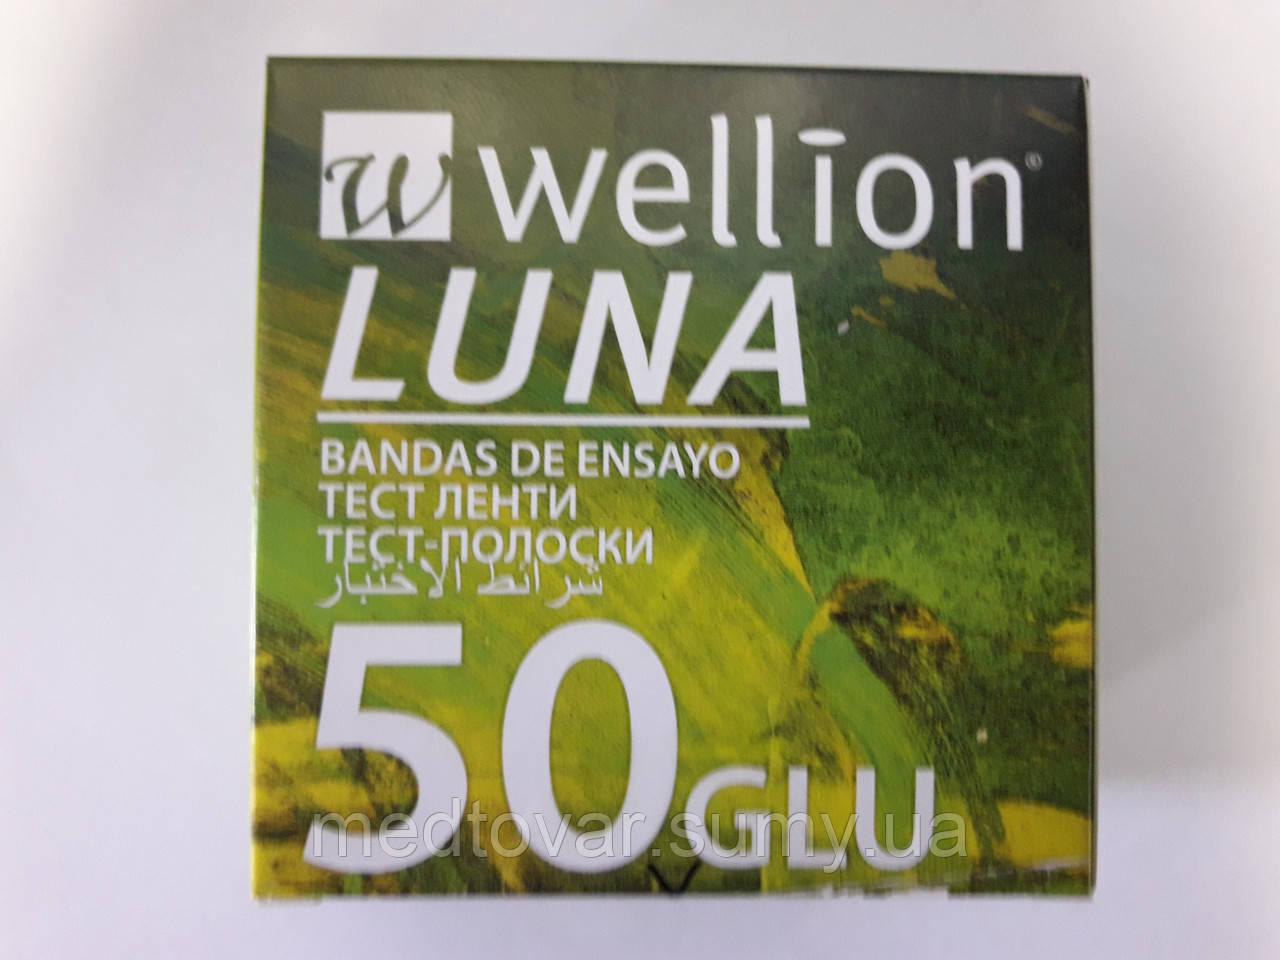 Тест-полоски Wellion Luna 50 шт.